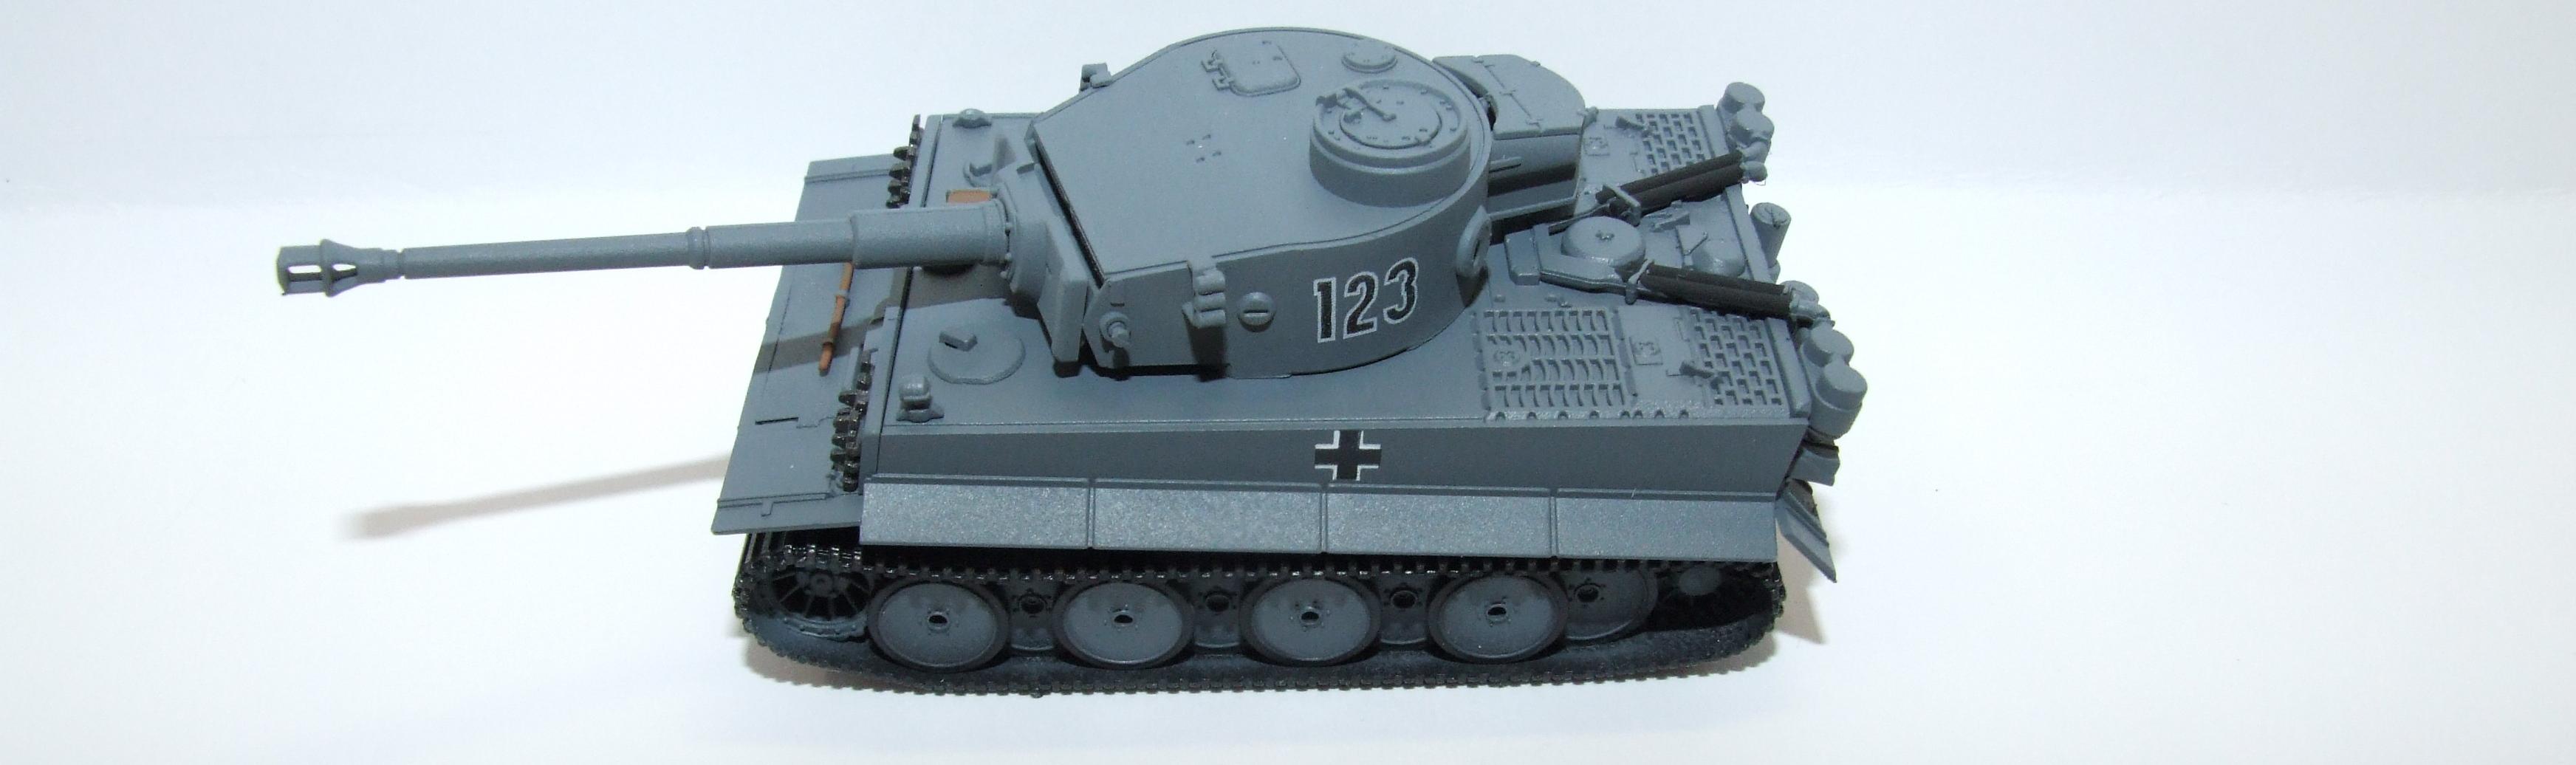 Herpa Military 745956  PzKpfW Tiger WW II EDW 1:87